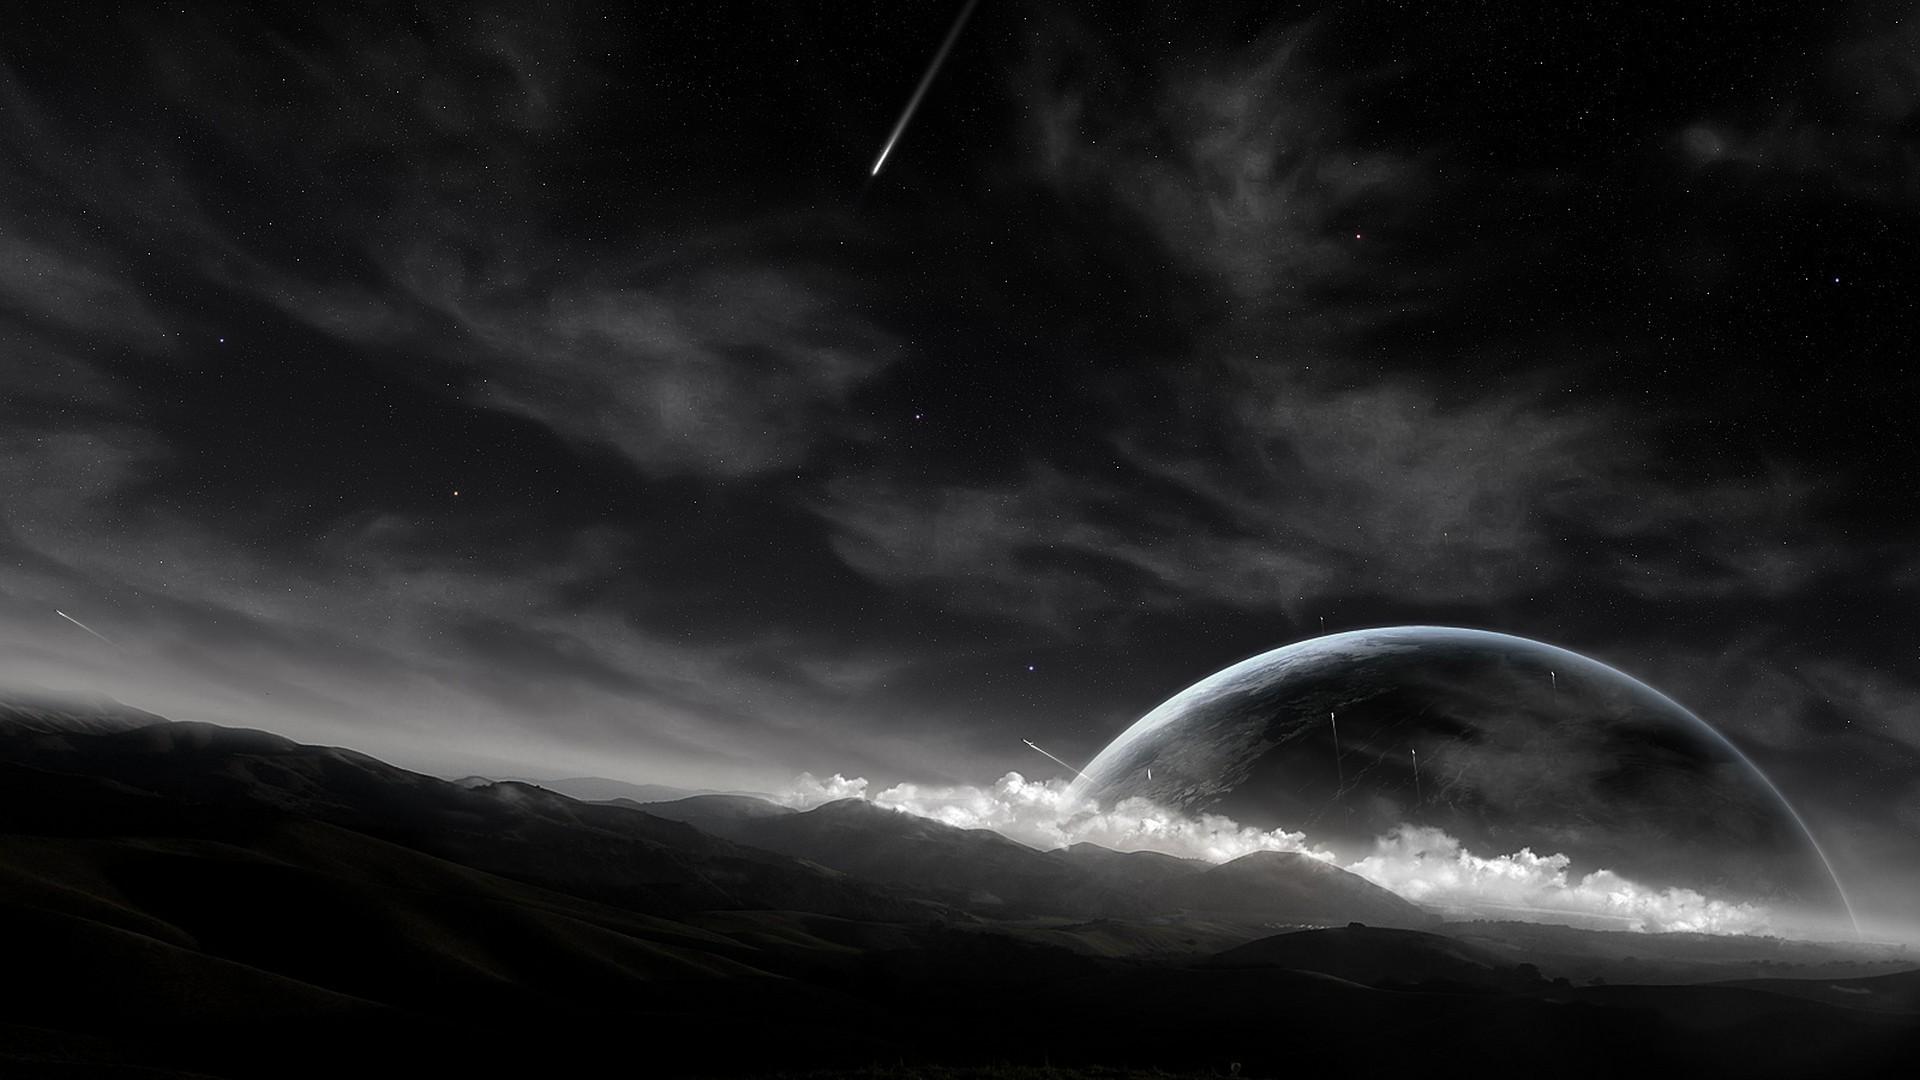 General 1920x1080 sky planet comet space